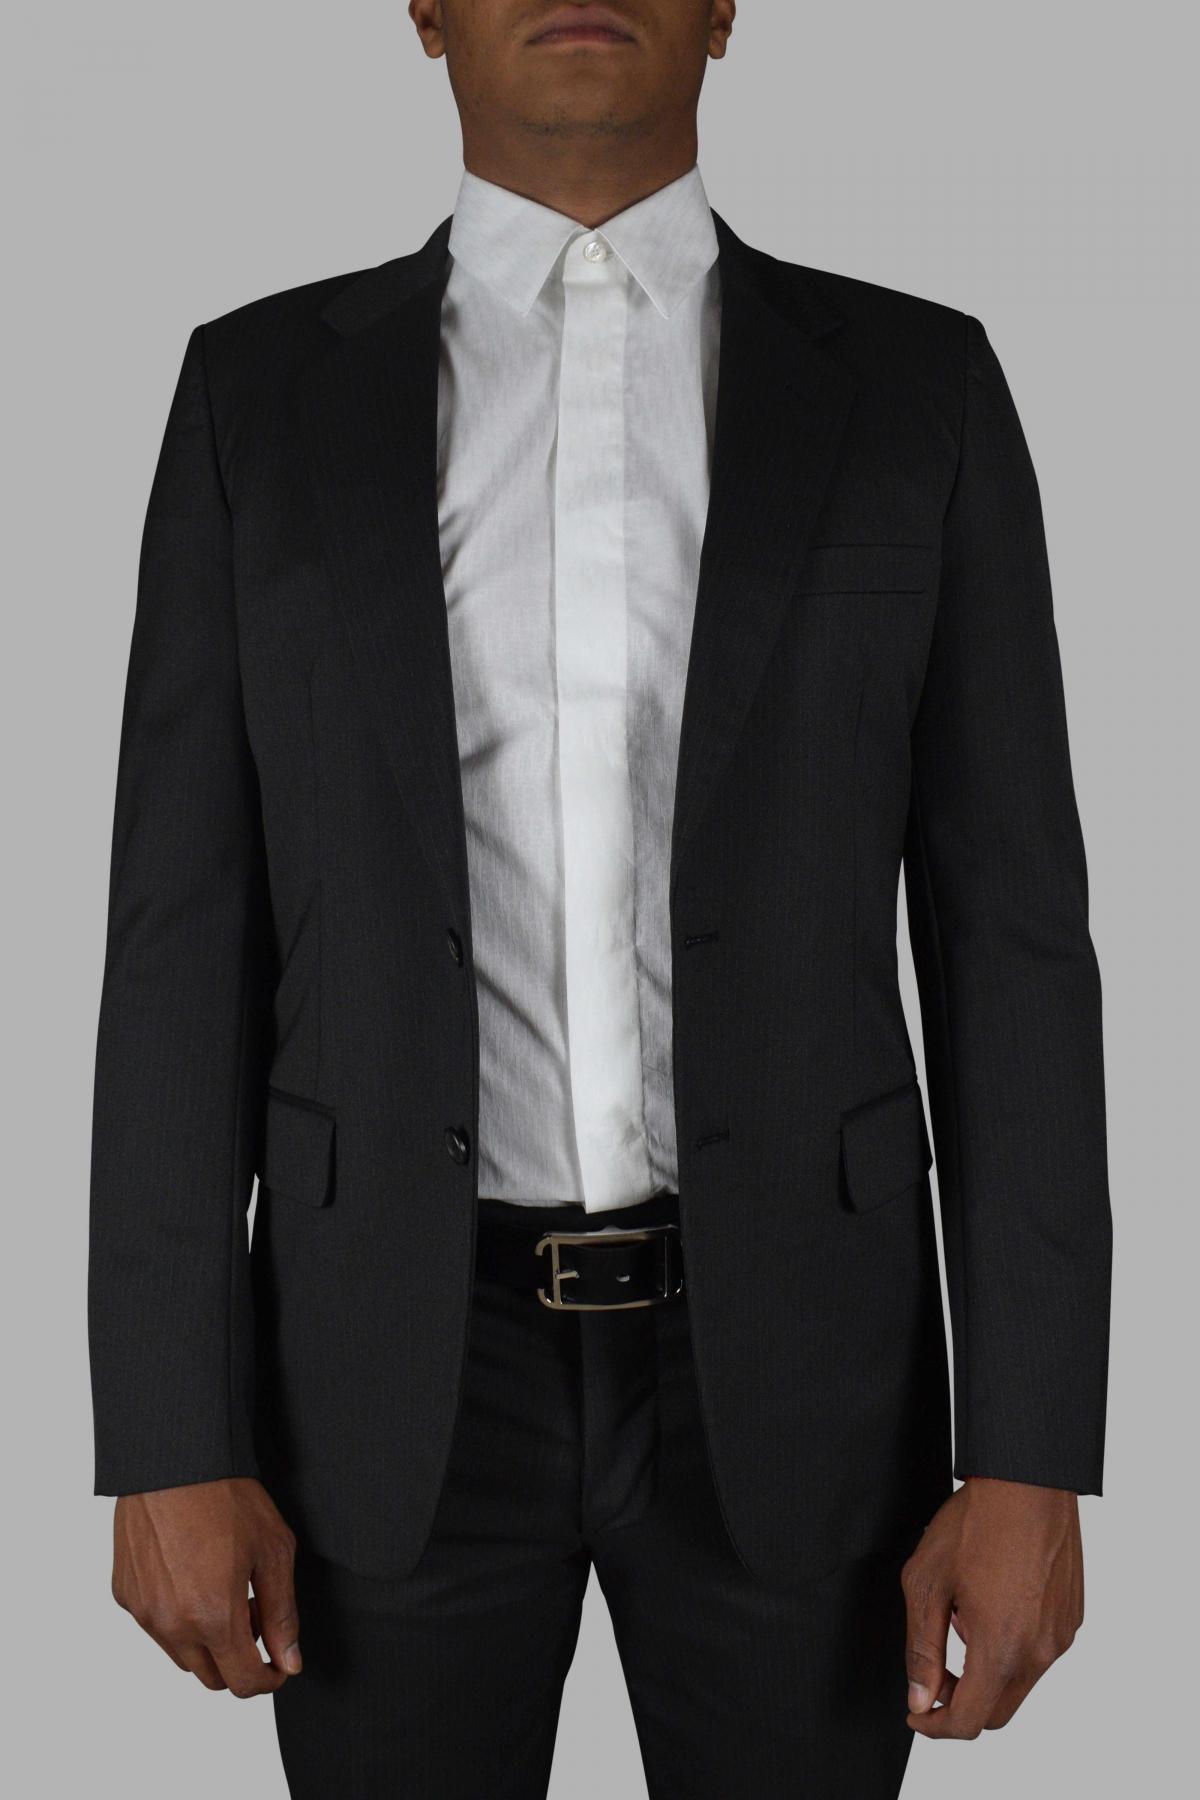 Prada two-piece gray suit with fine white stripes.